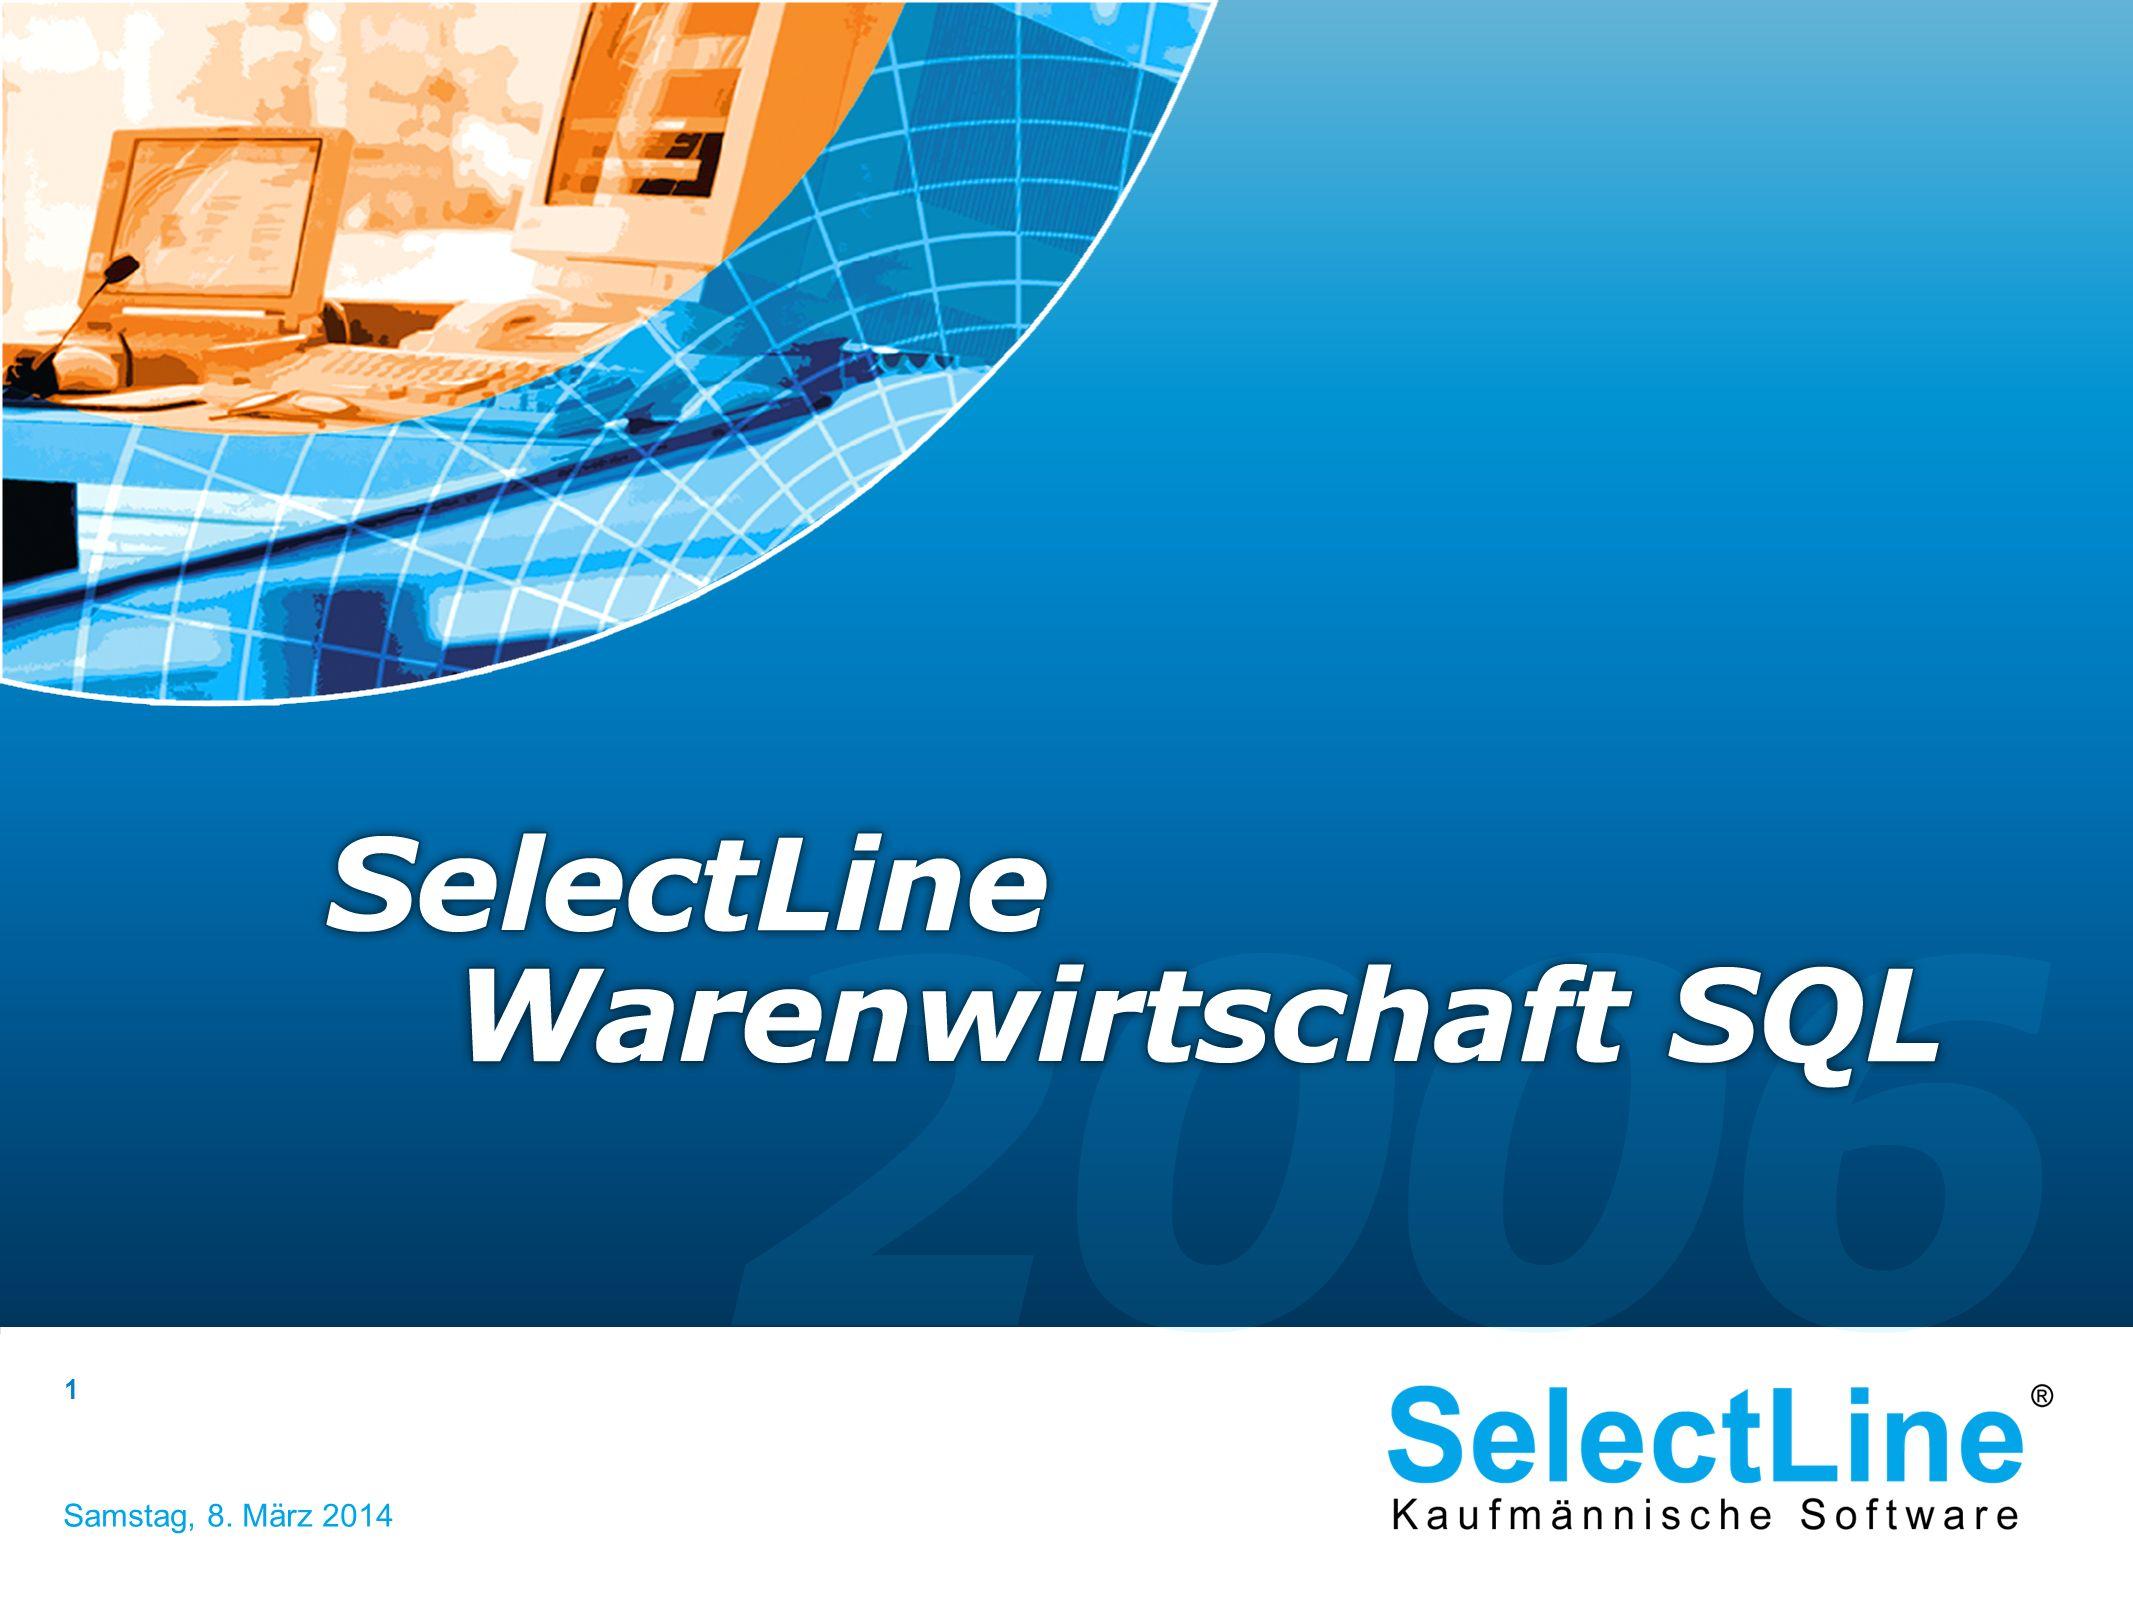 SelectLine Software GmbH – Nachtweide 82 c – 39124 Magdeburg Samstag, 8. März 2014 1